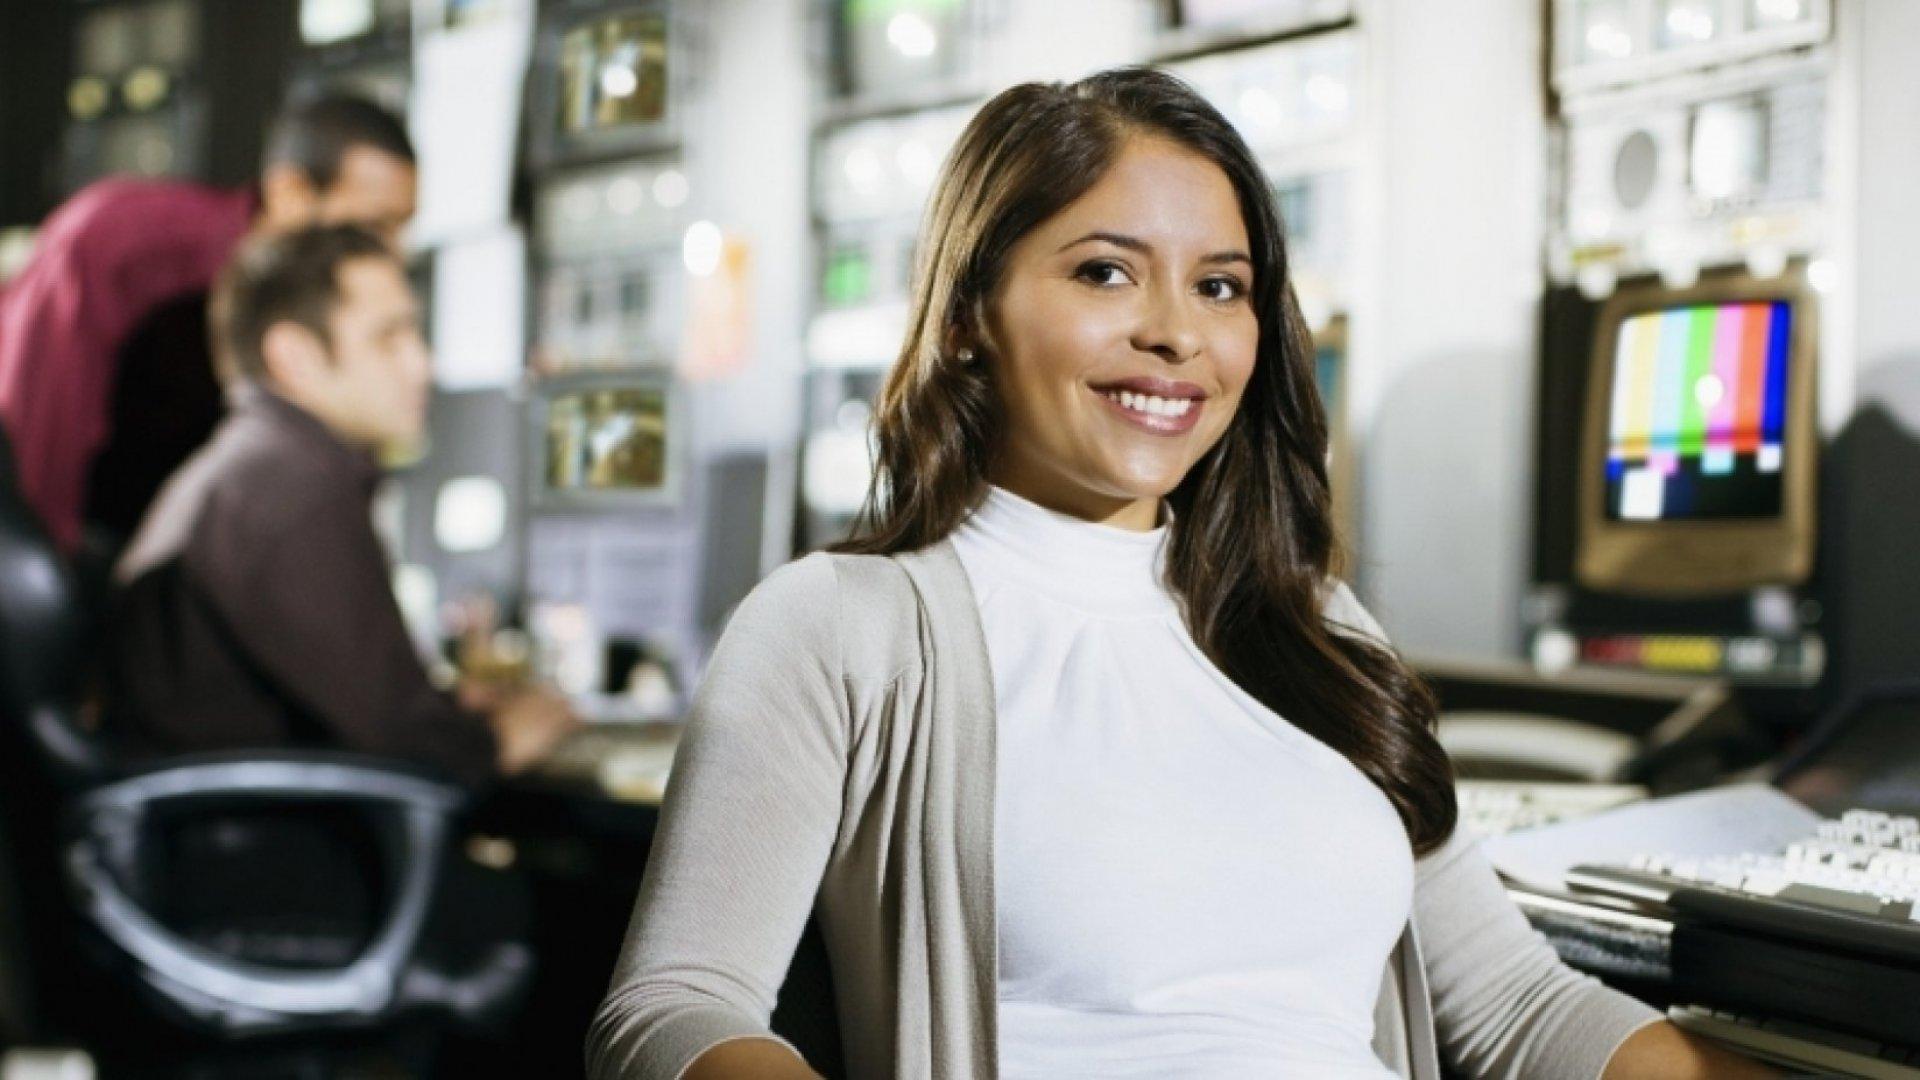 How to Build a Brand Newsroom Like GE